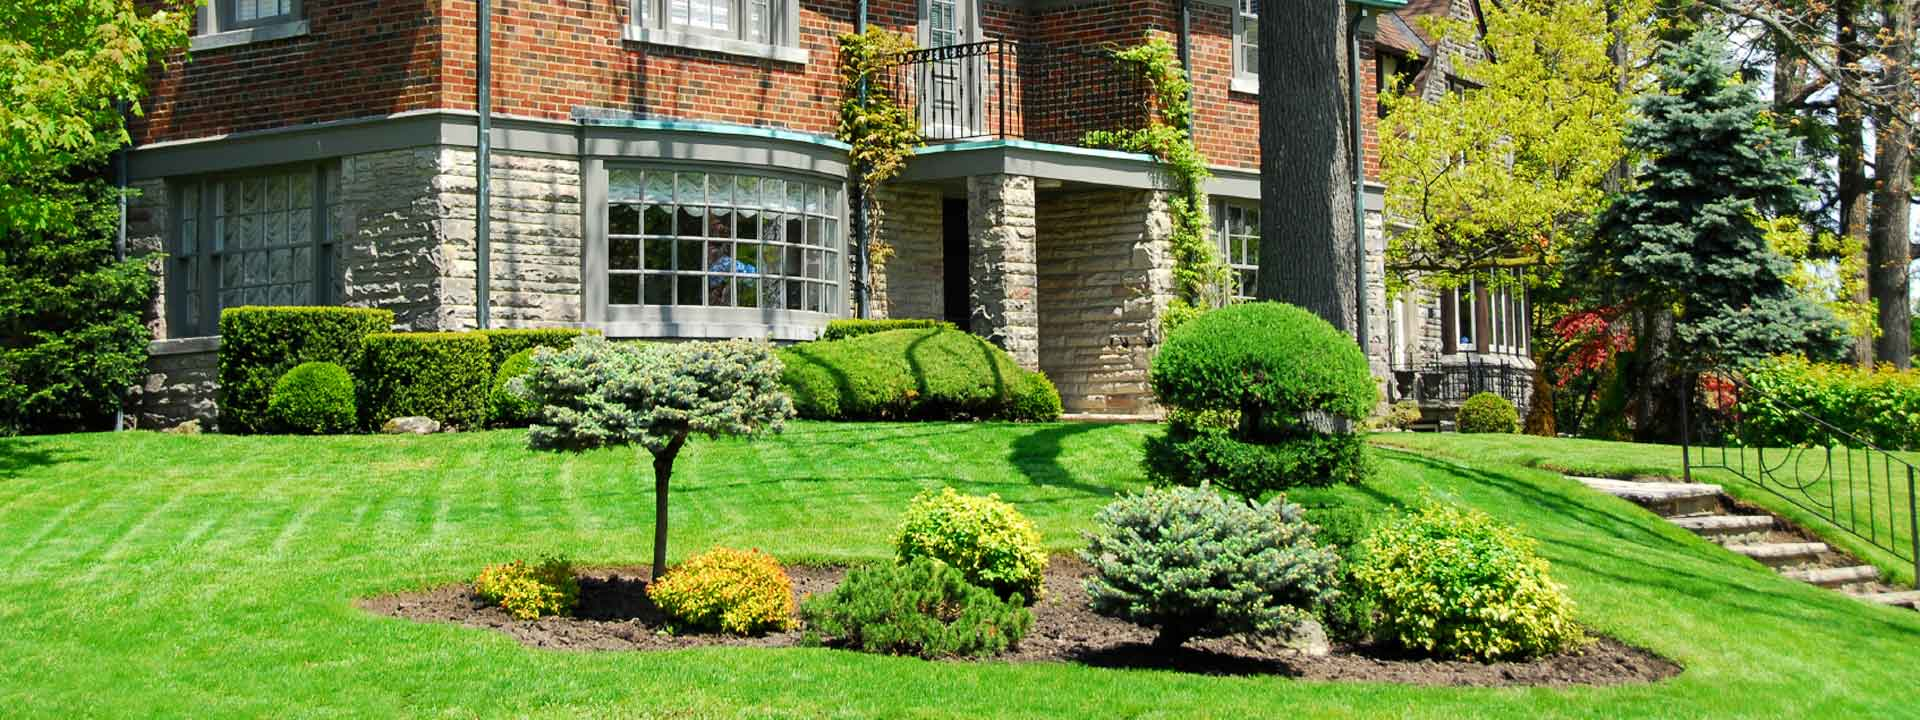 Savarino Brothers Garden Center